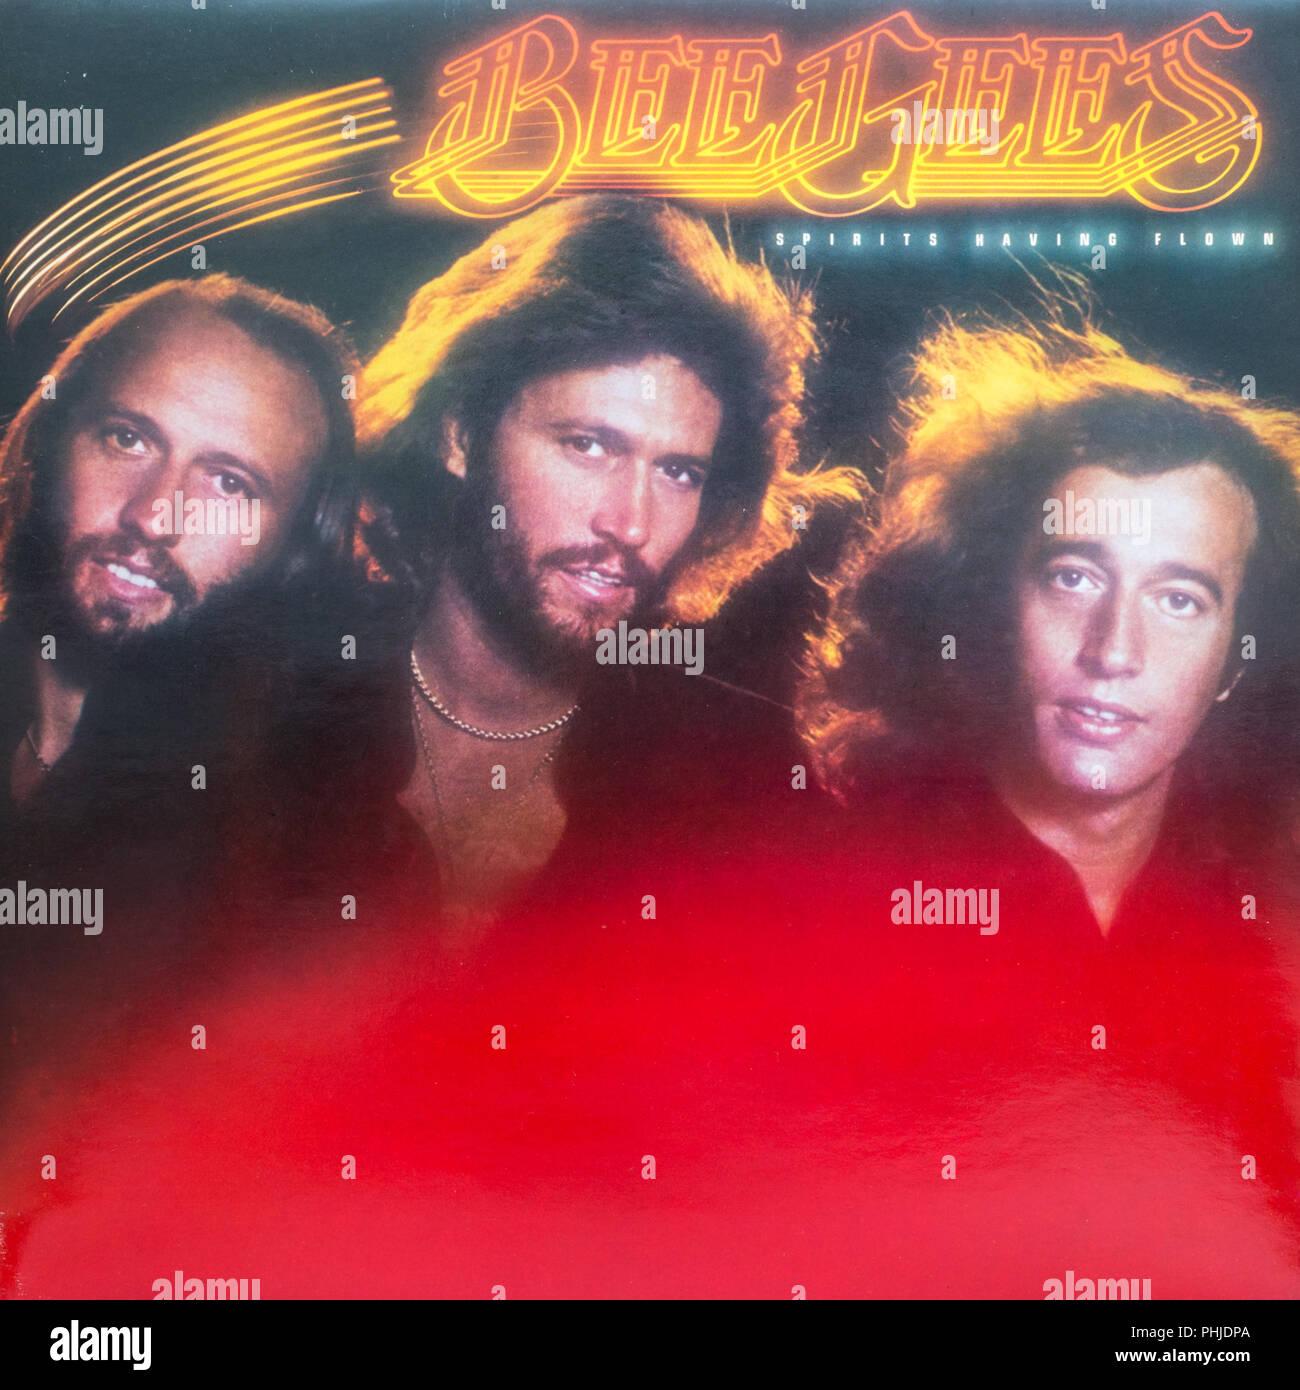 Bee Gees Spirits Having Flown album cover - Stock Image